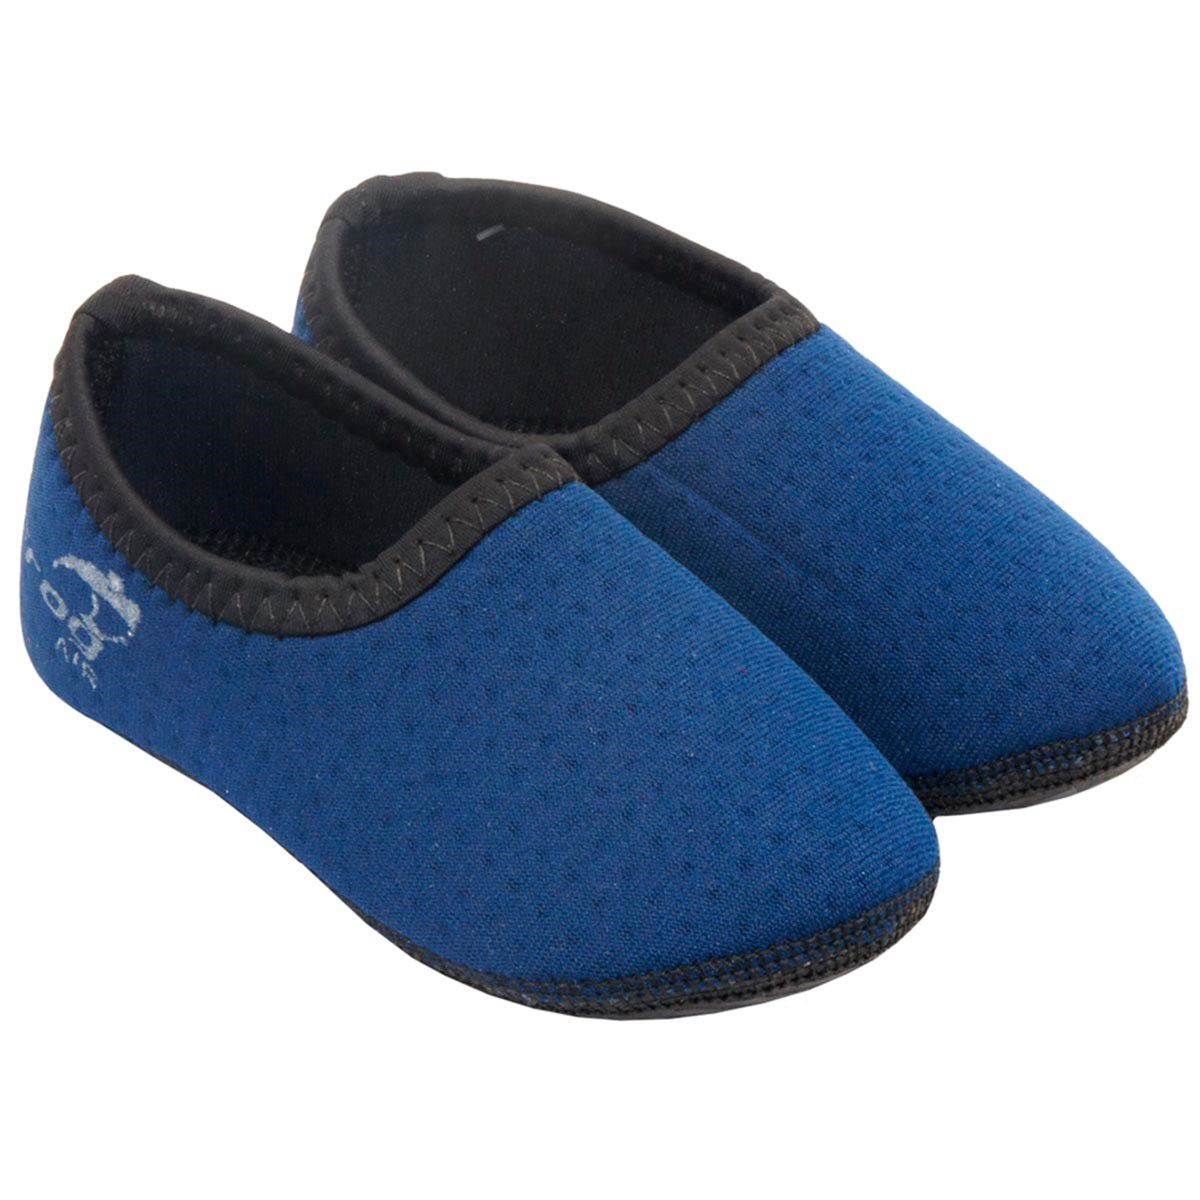 Kit Pai e Filho - Sapato de Neoprene Fit Azul Marinho Ufrog